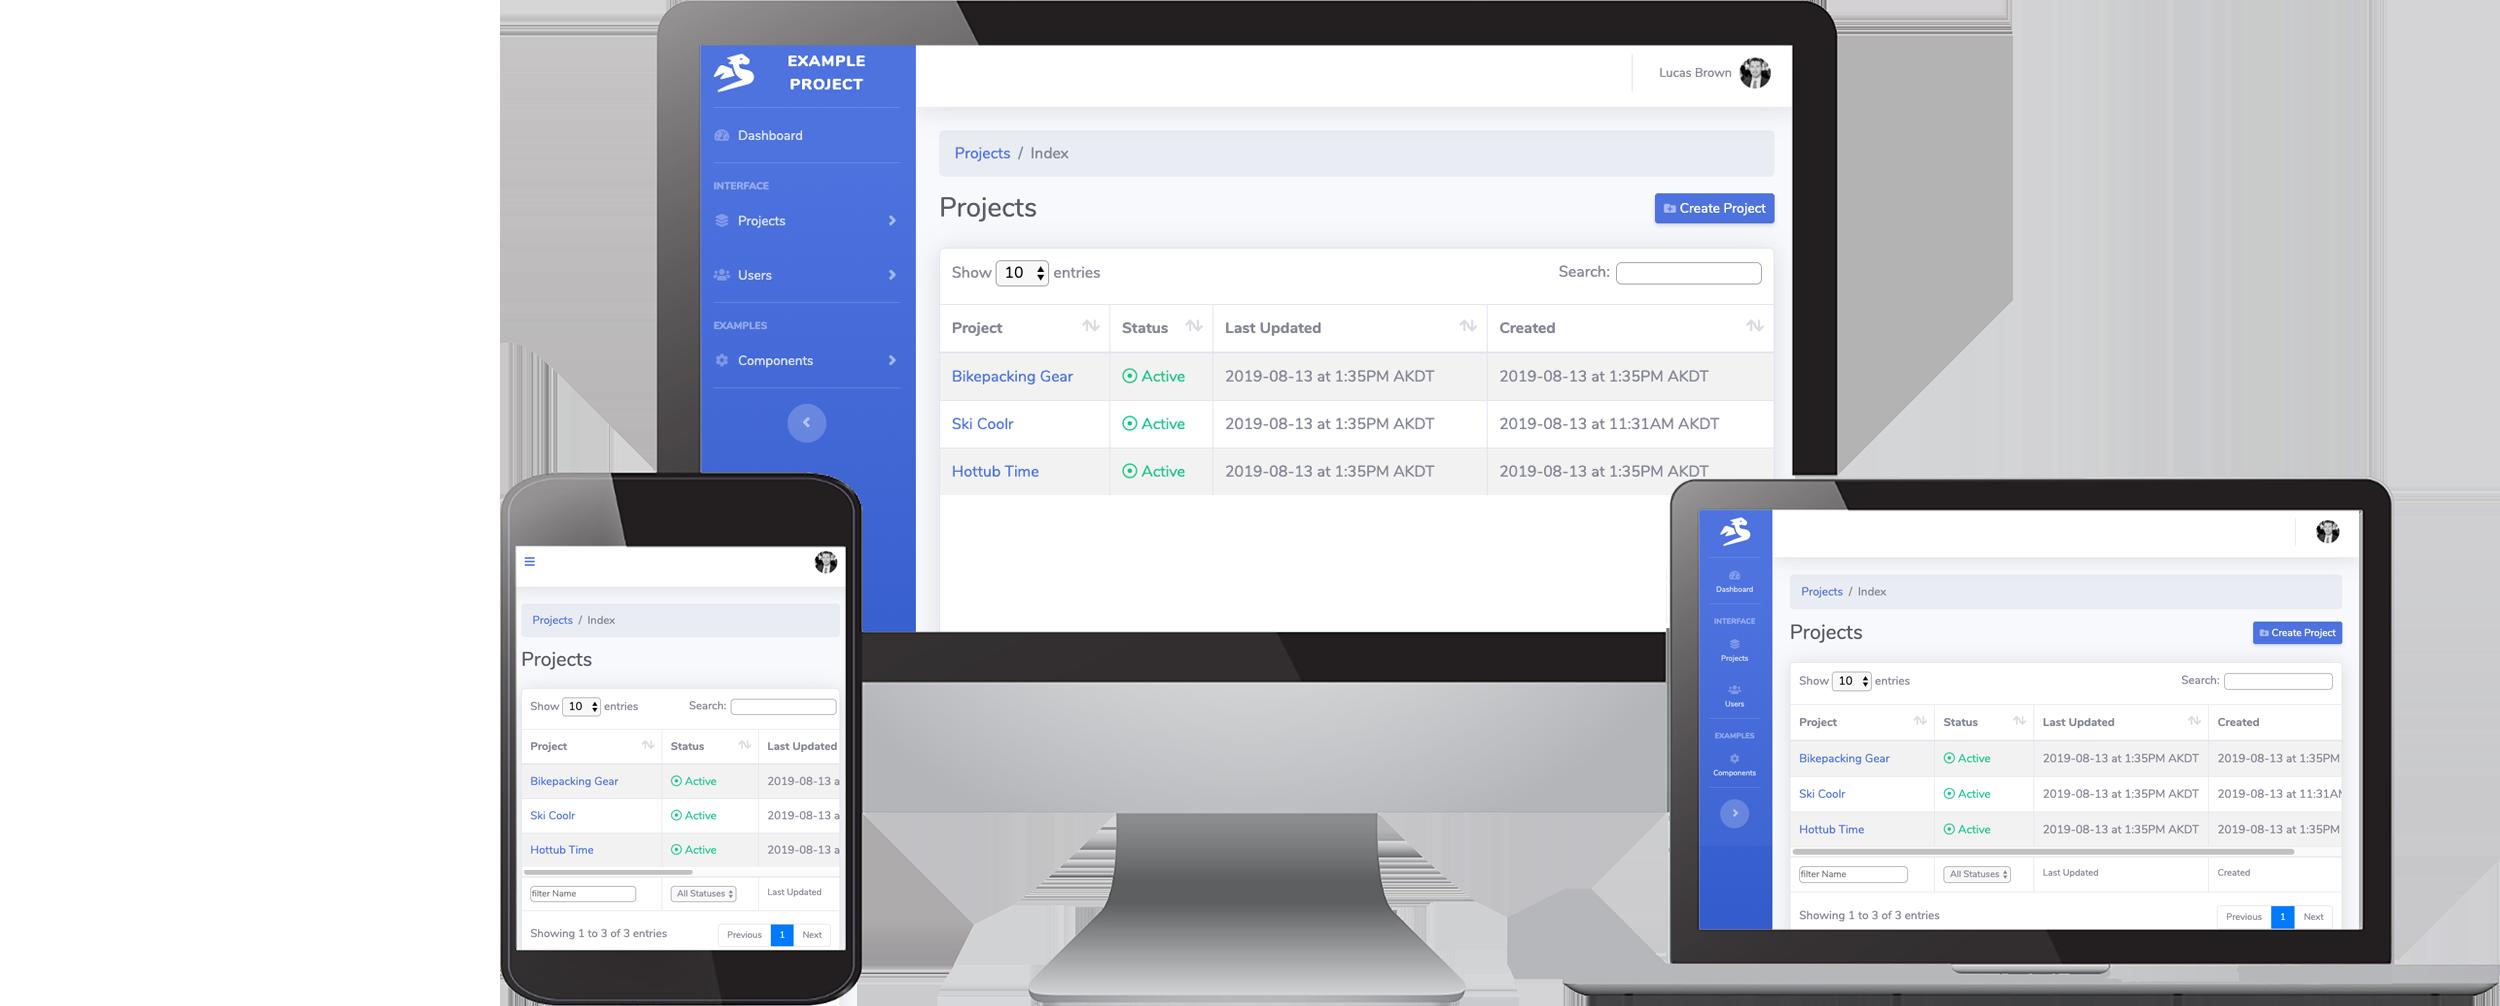 Go boilerplate code for responsive web app